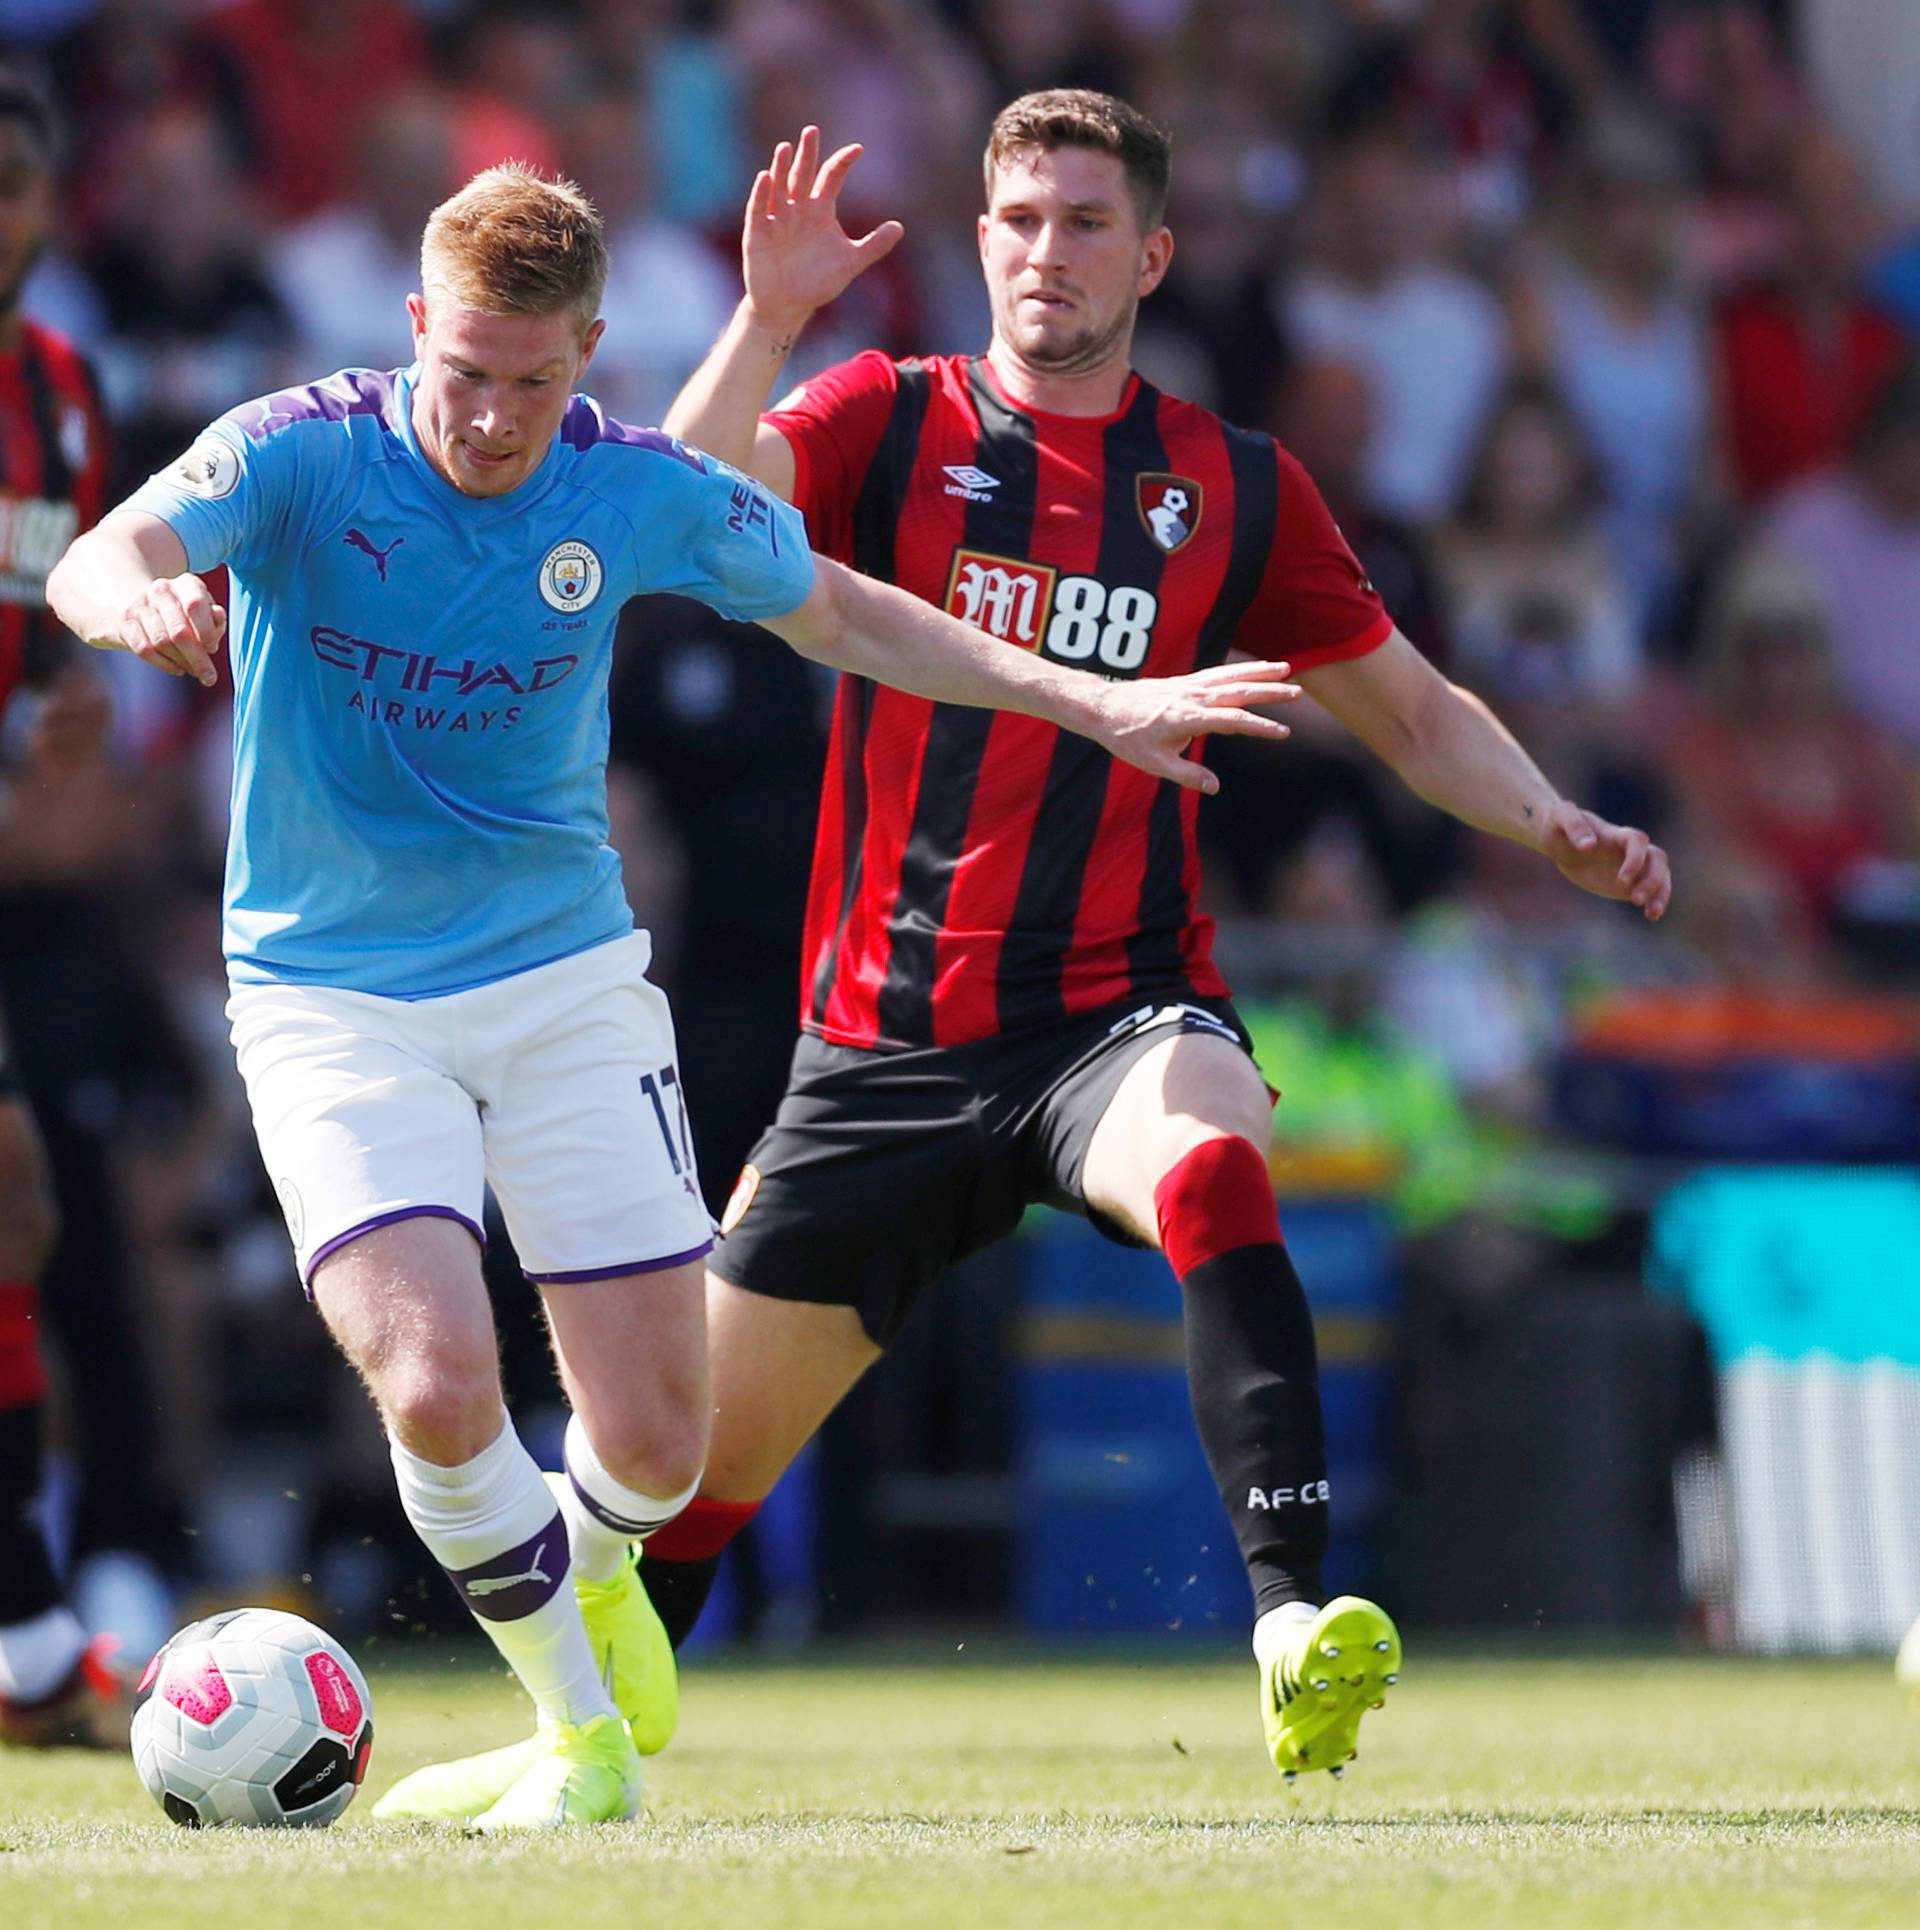 Premier League - AFC Bournemouth v Manchester City